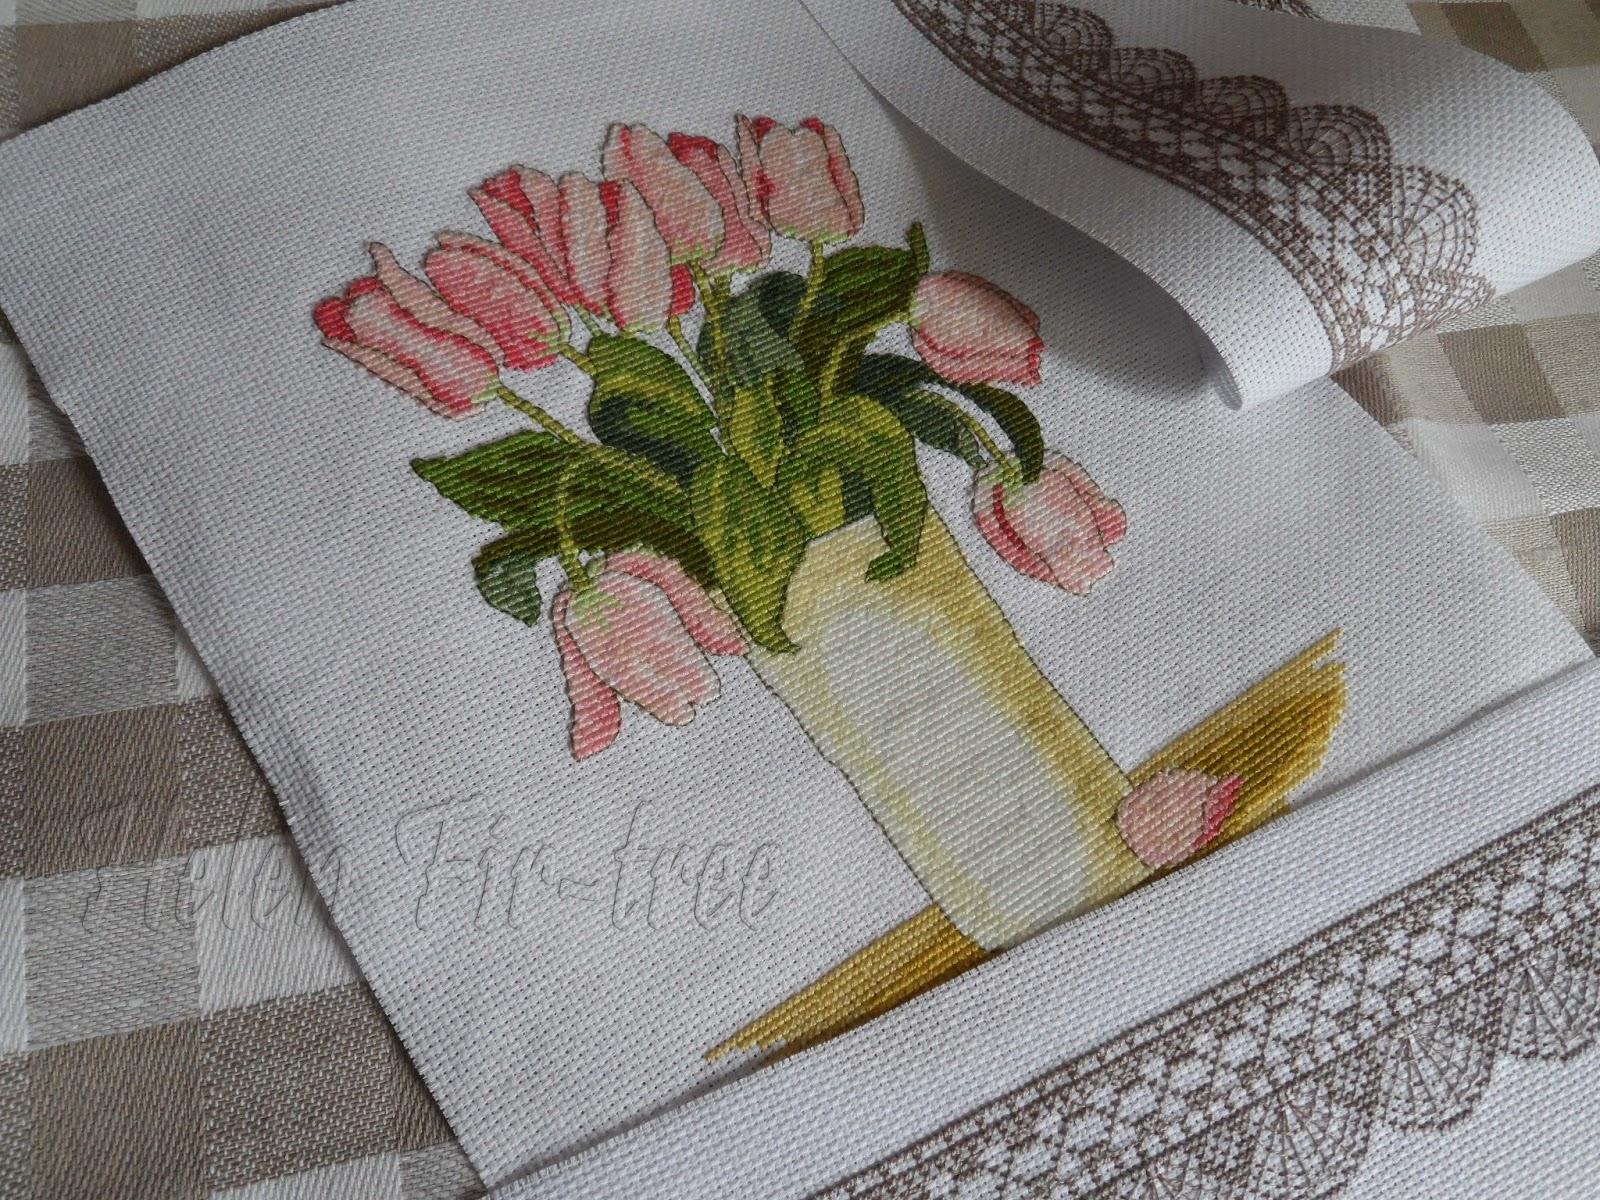 Helen Fir-tree вышивка крестом тюльпаны cross stitch tulip pillow